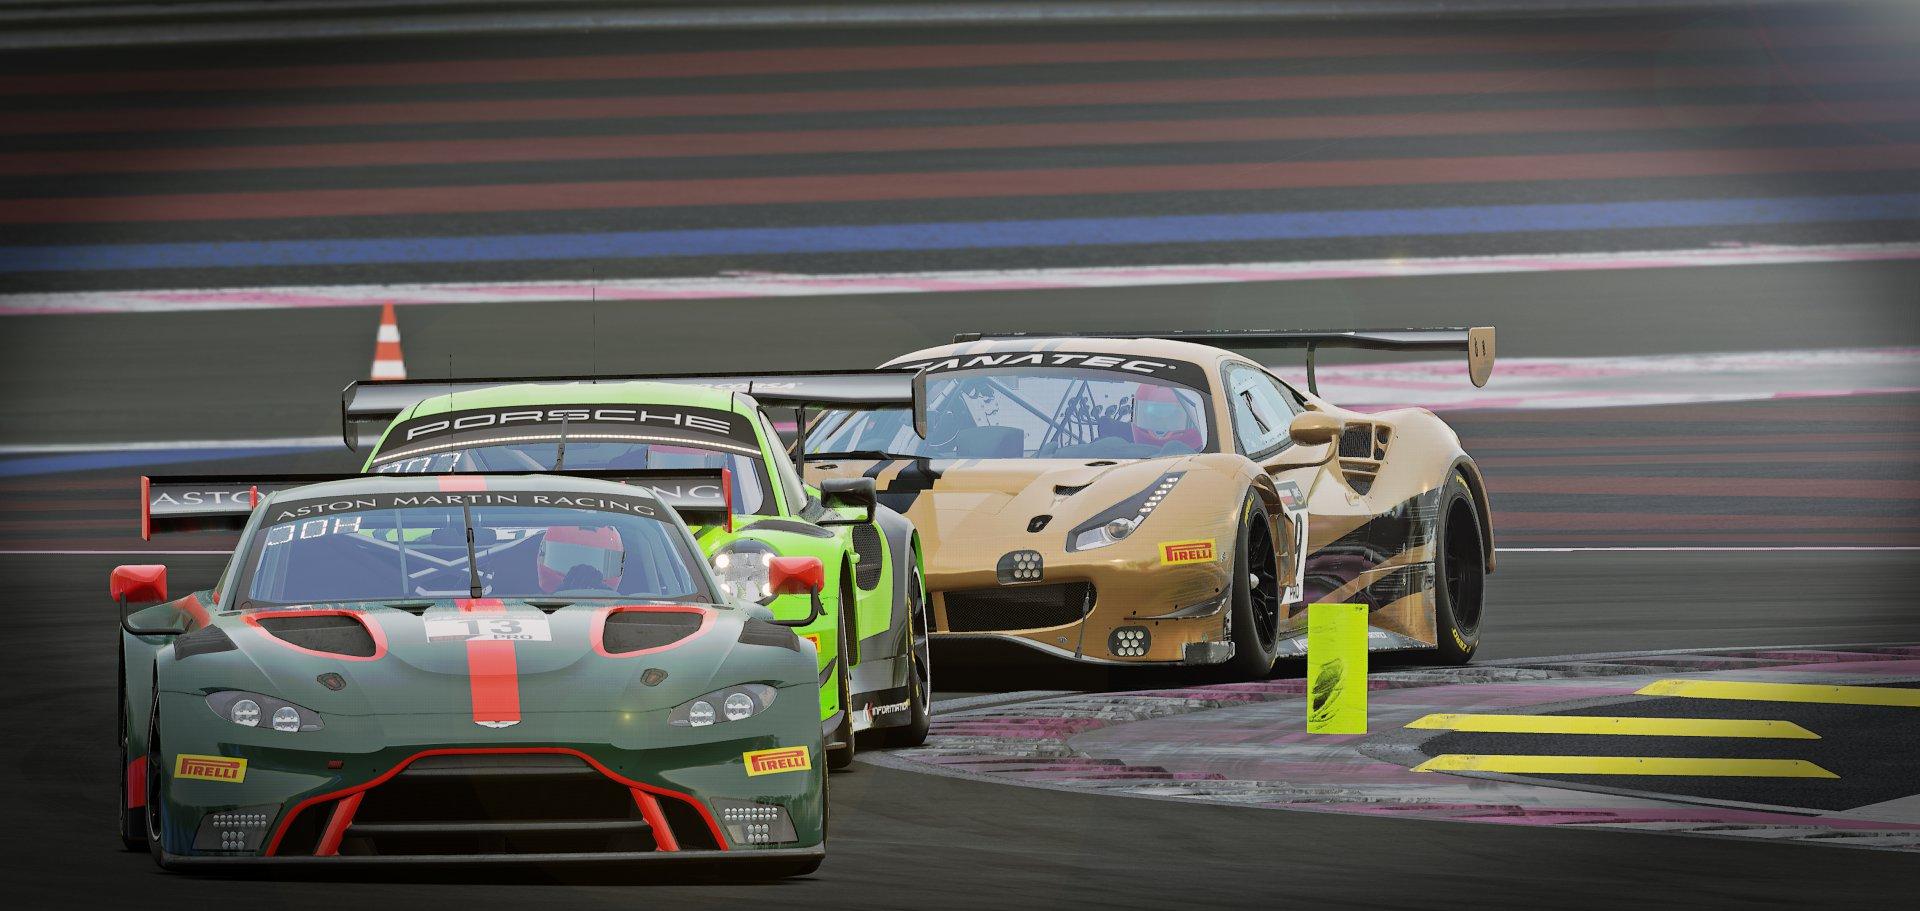 Assetto Corsa Competizione Screenshot 2021.05.17 - 11.19.46.20.jpg